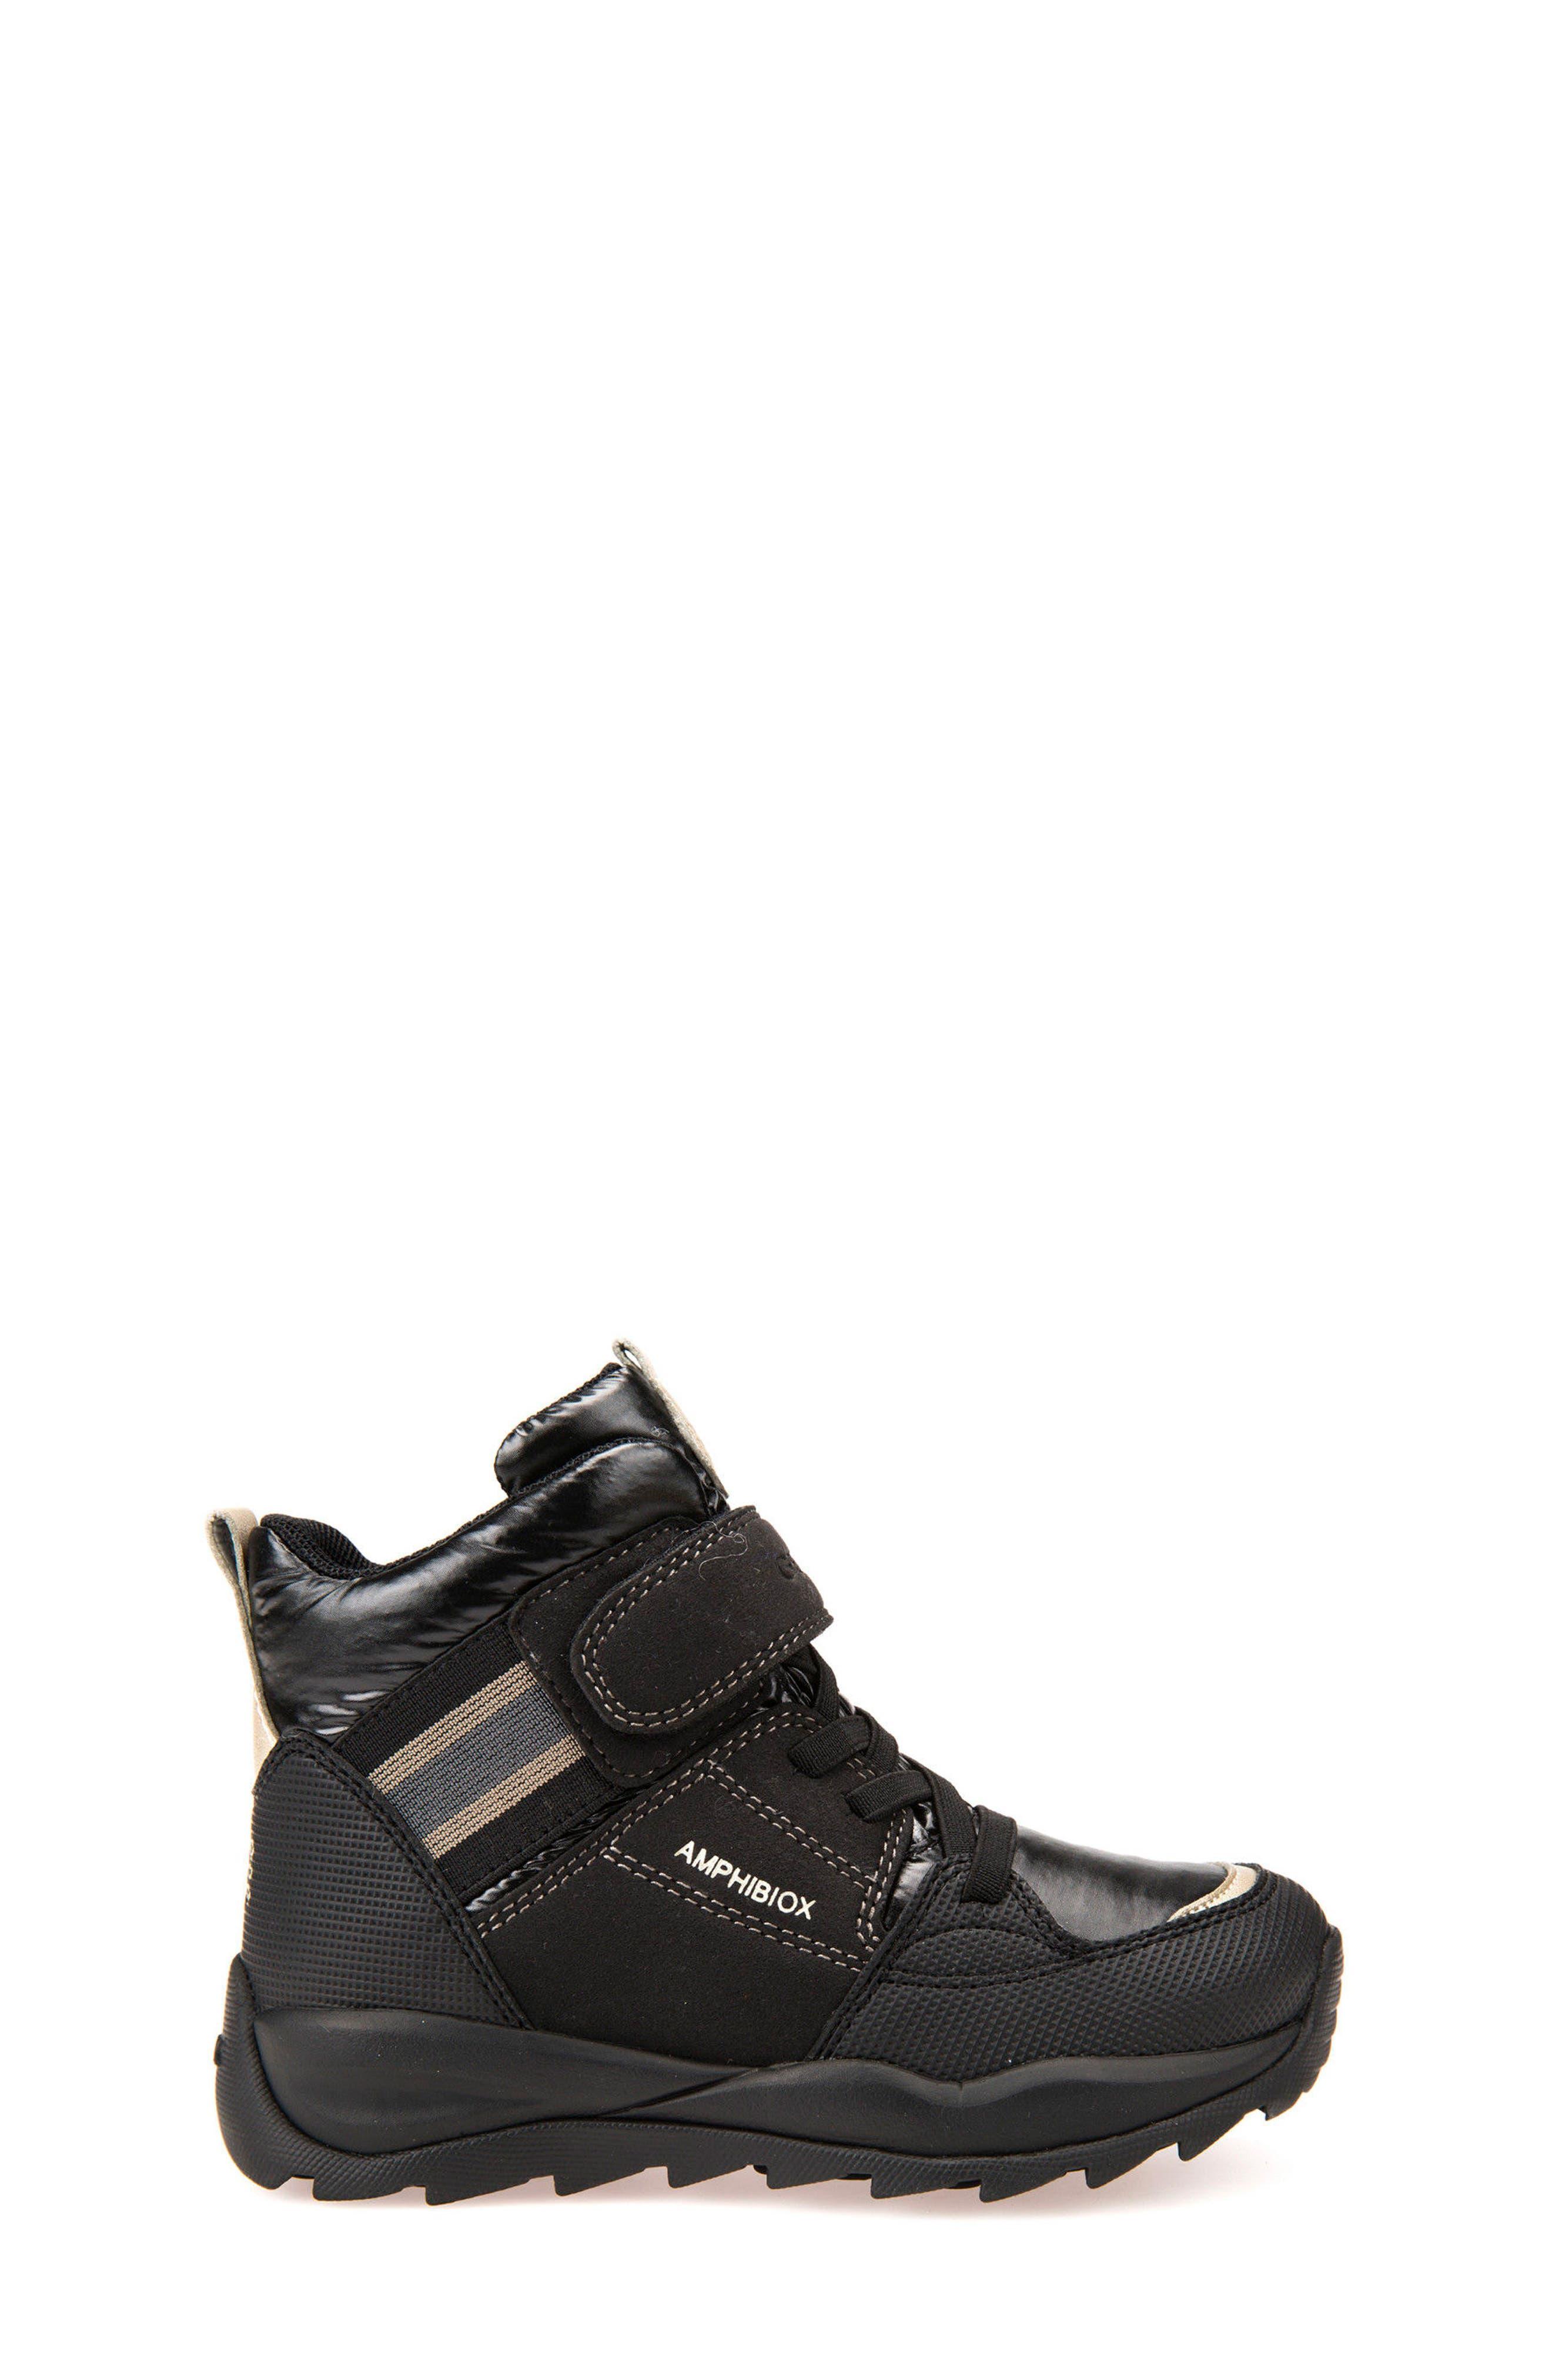 Orizont ABX Waterproof Boot,                             Alternate thumbnail 3, color,                             001